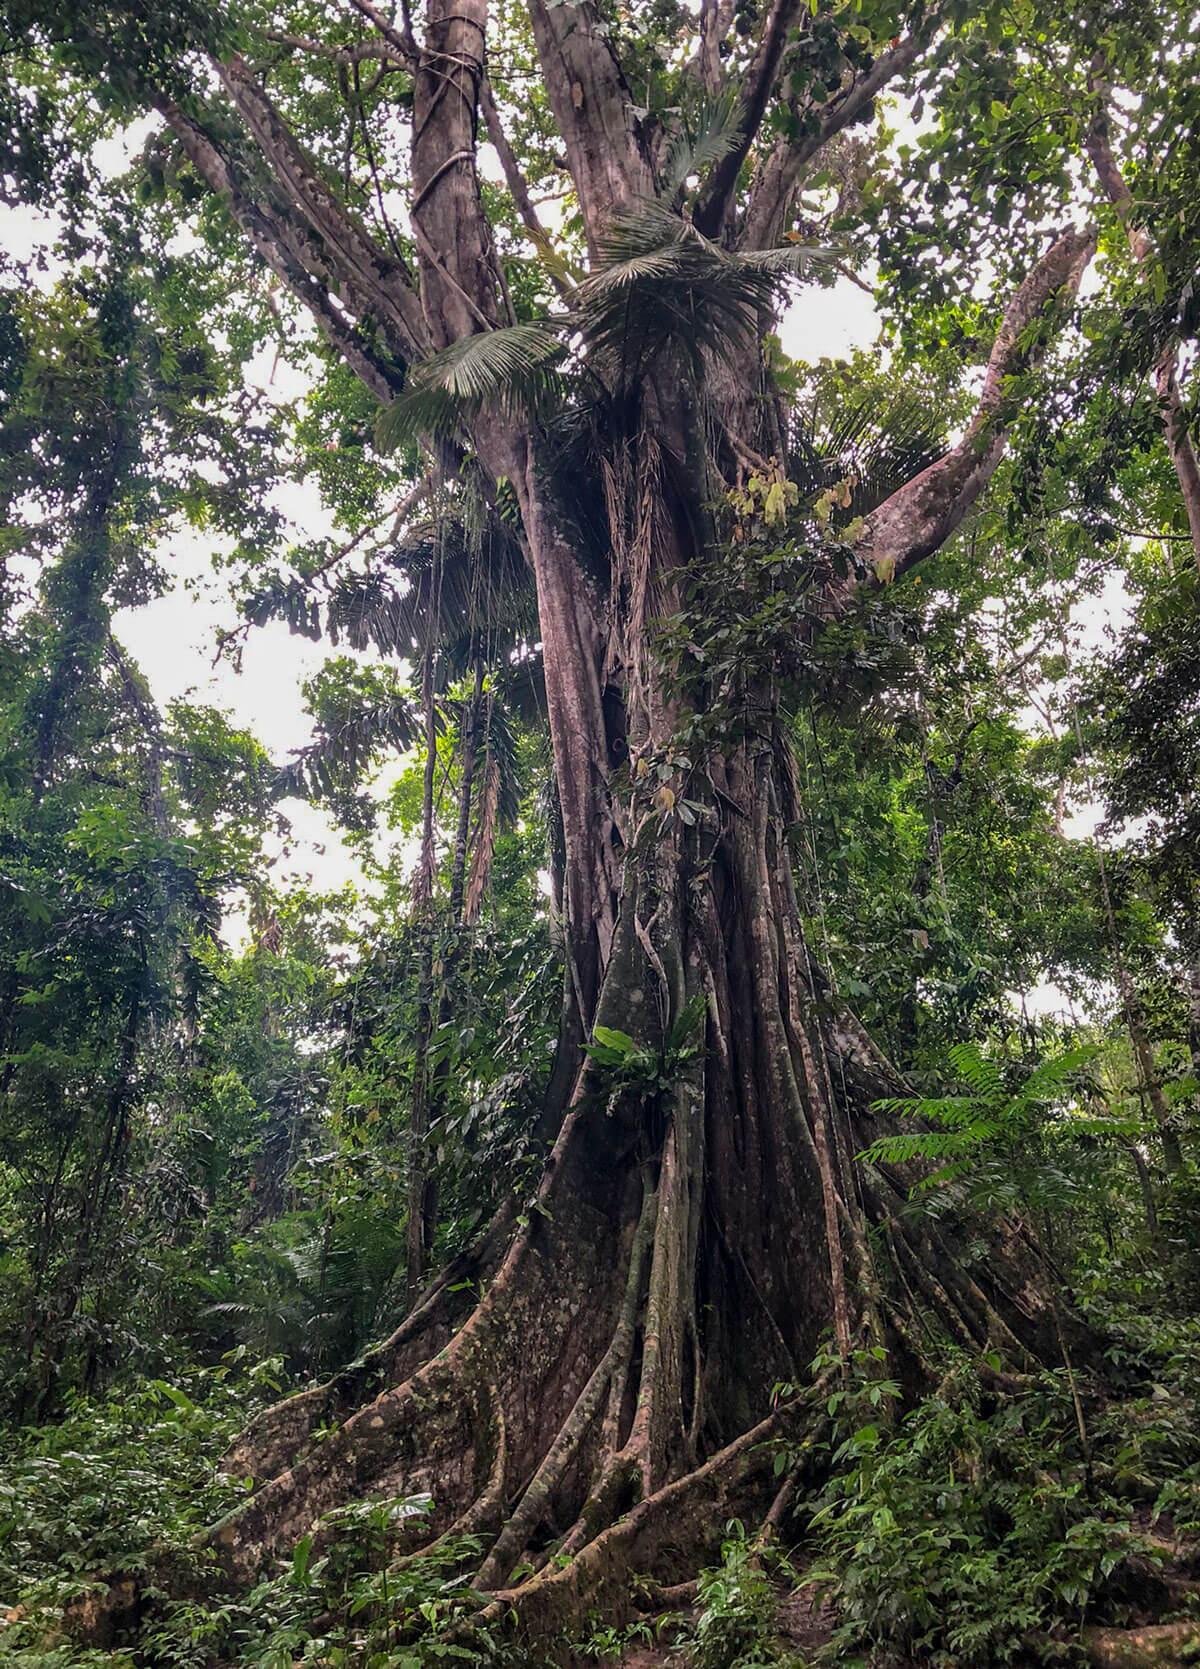 Peru Regenwald Baumriese